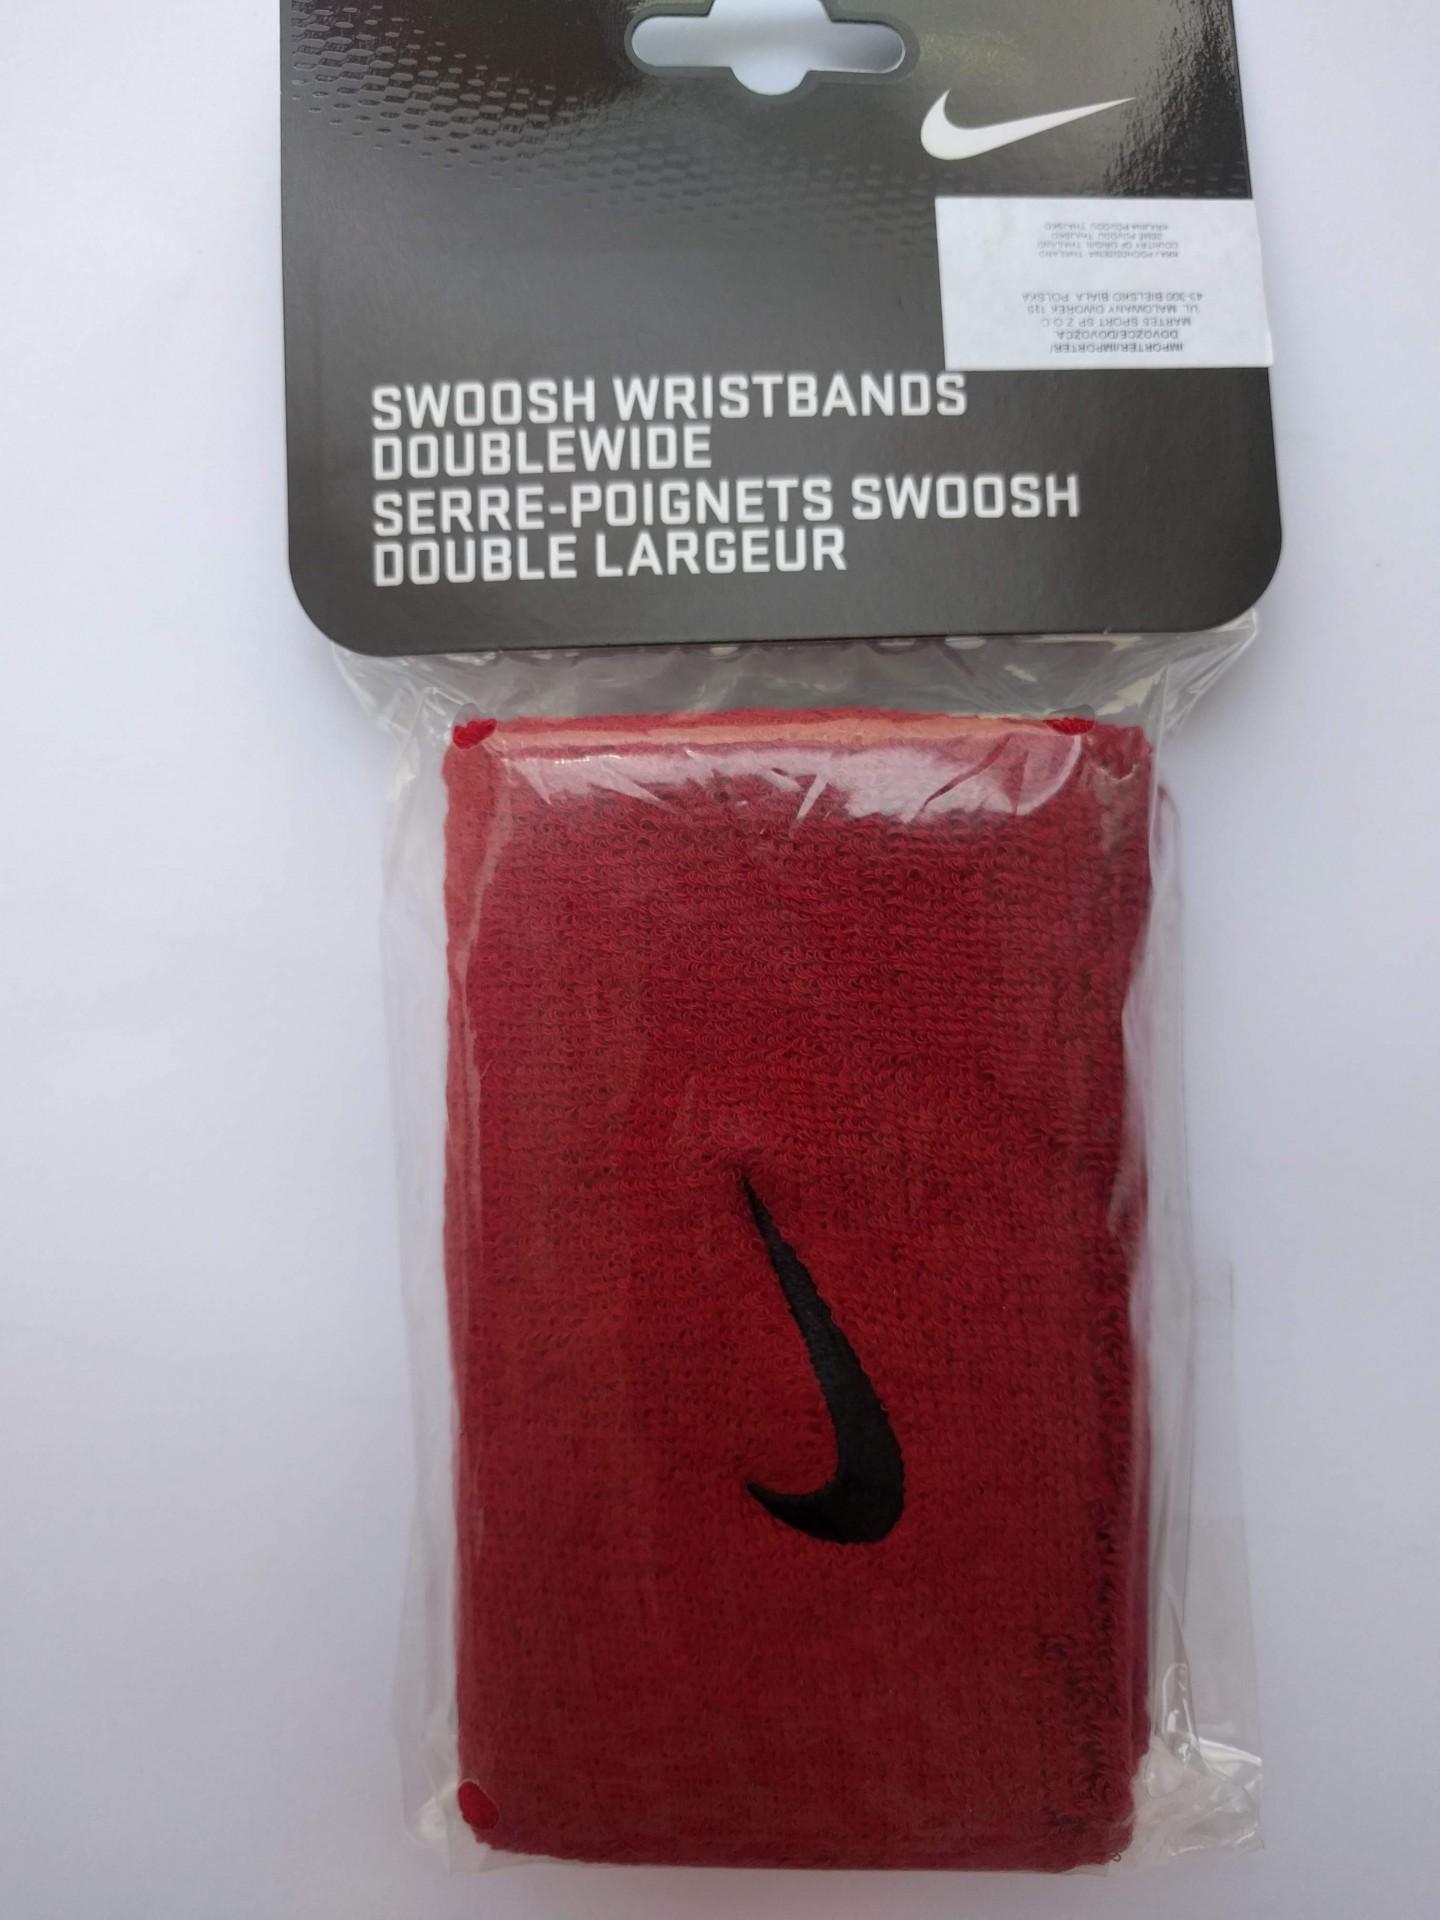 Tenisové potítko Nike Swoosh Wristbands Doublewide červená 0a9c3e575c